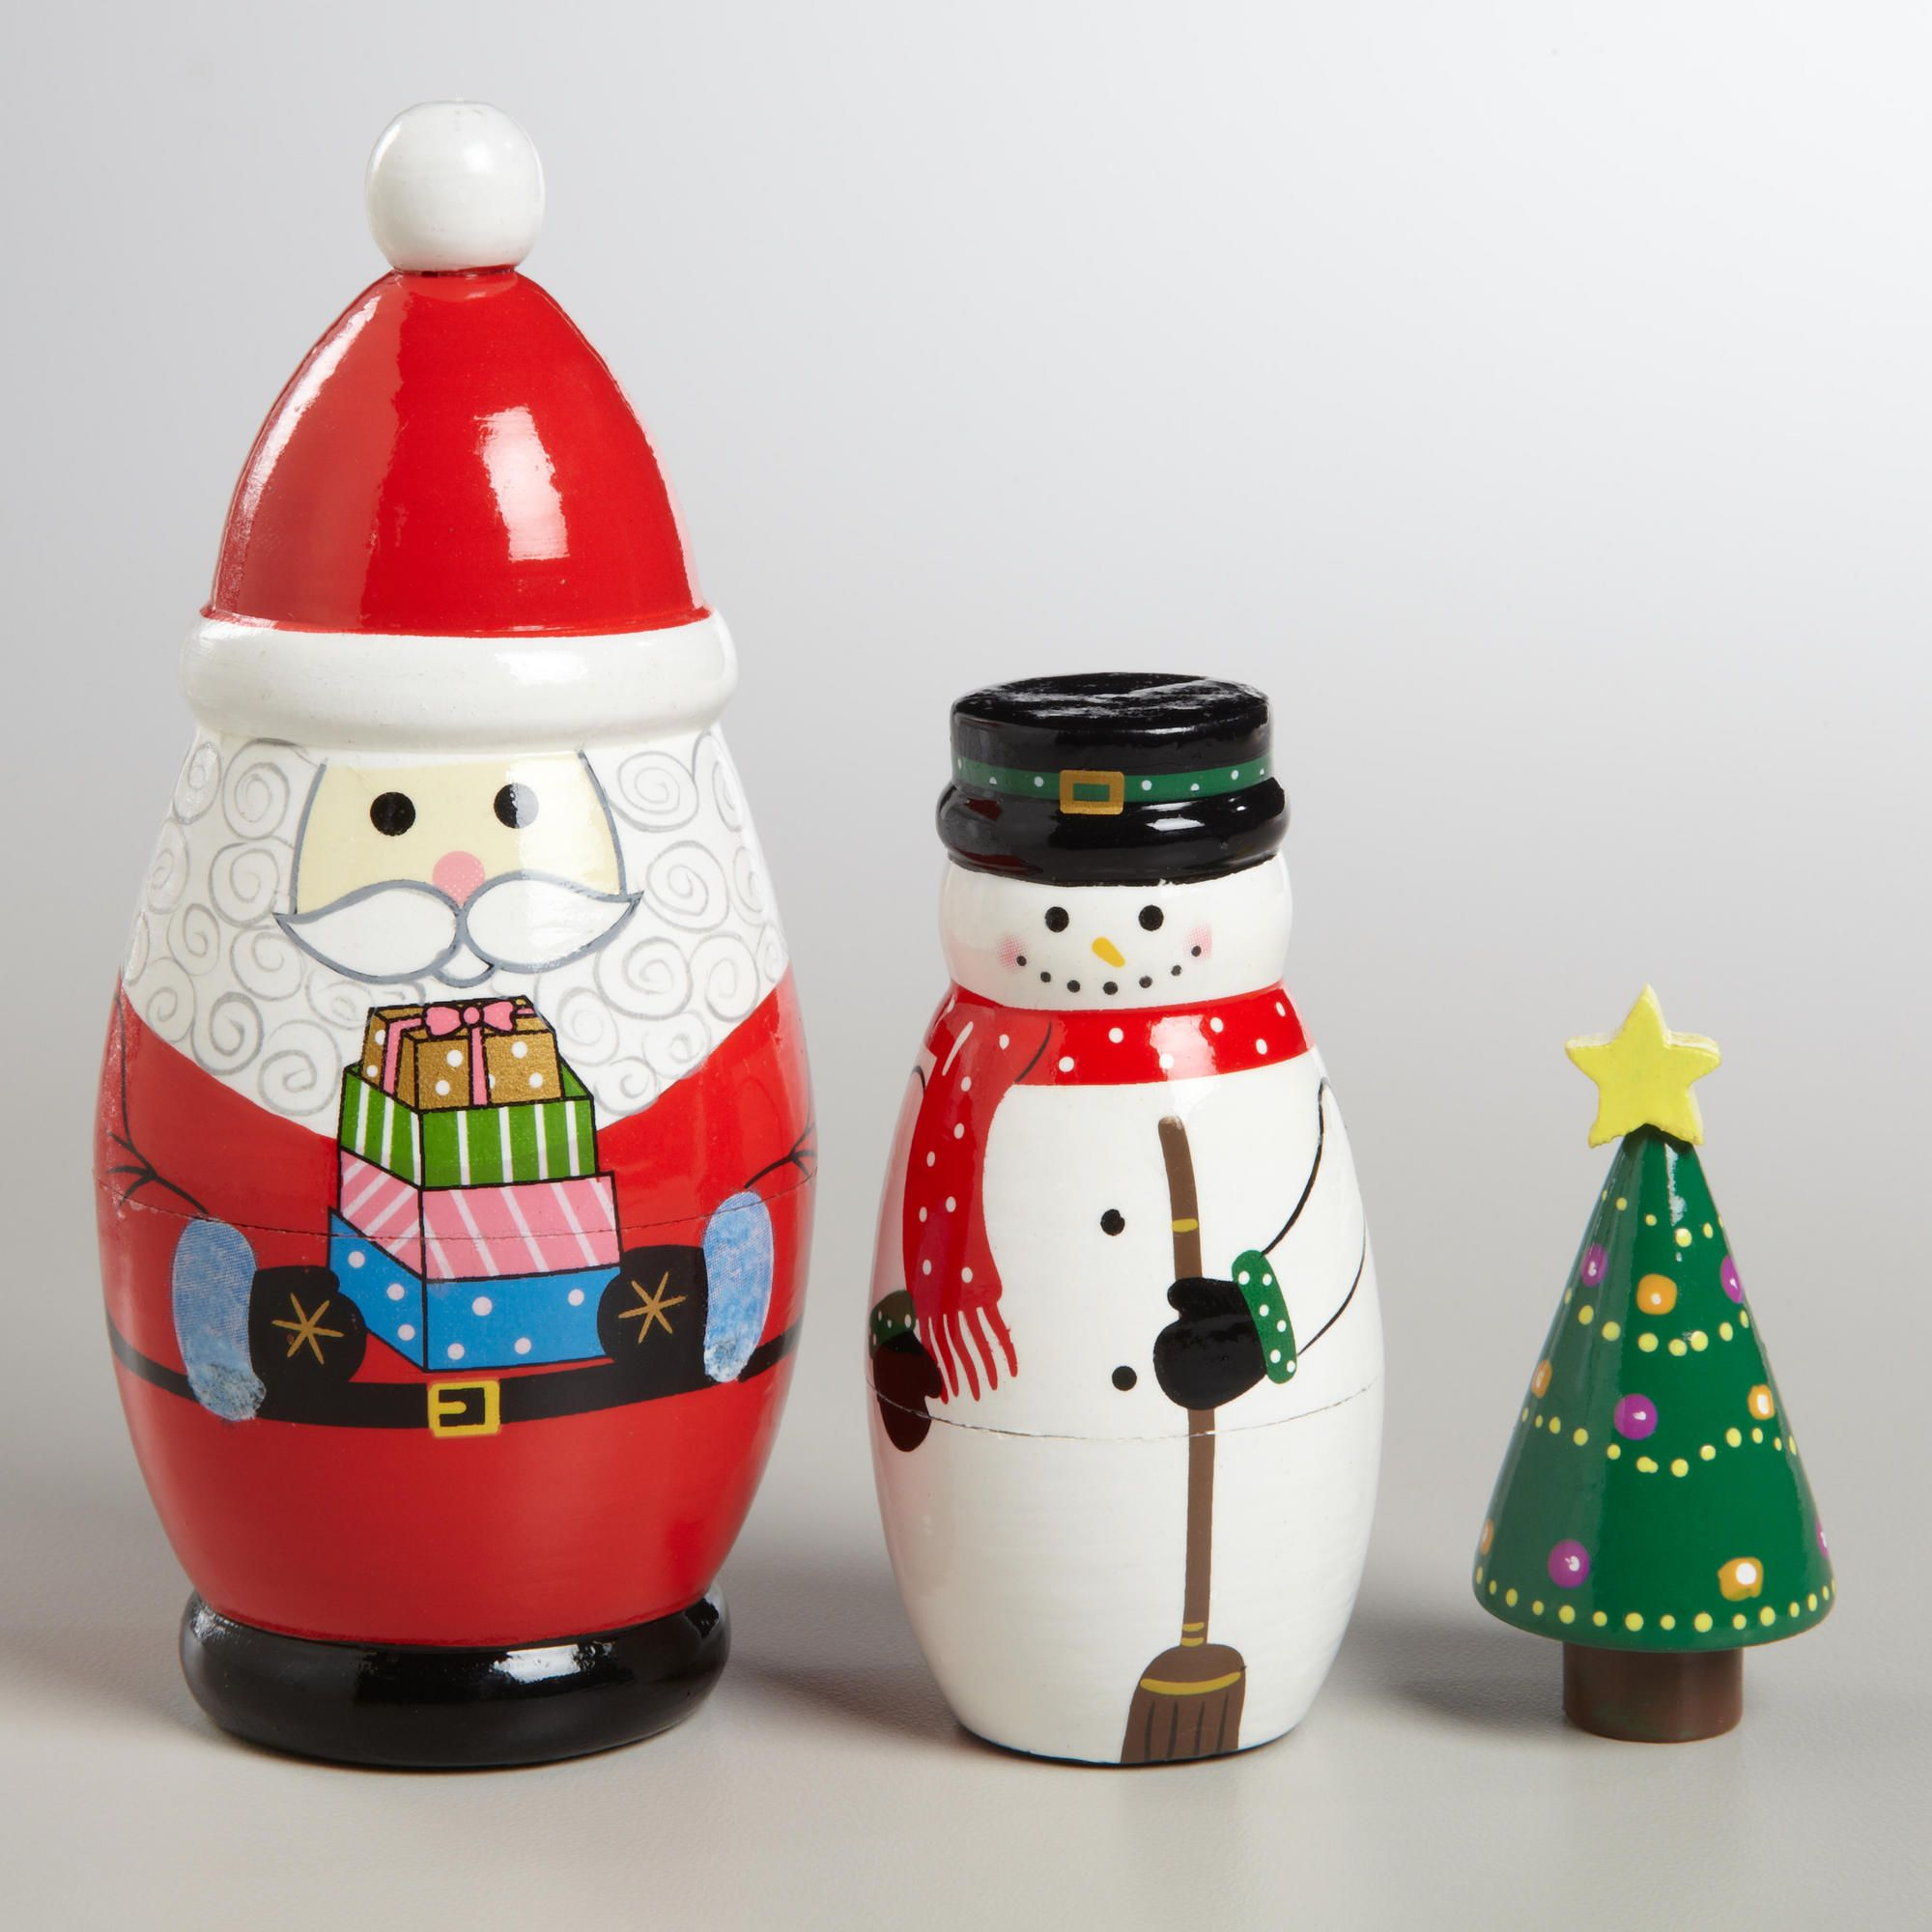 3 pcs Russian Nesting doll Christmas Tree 6.3 Wooden image